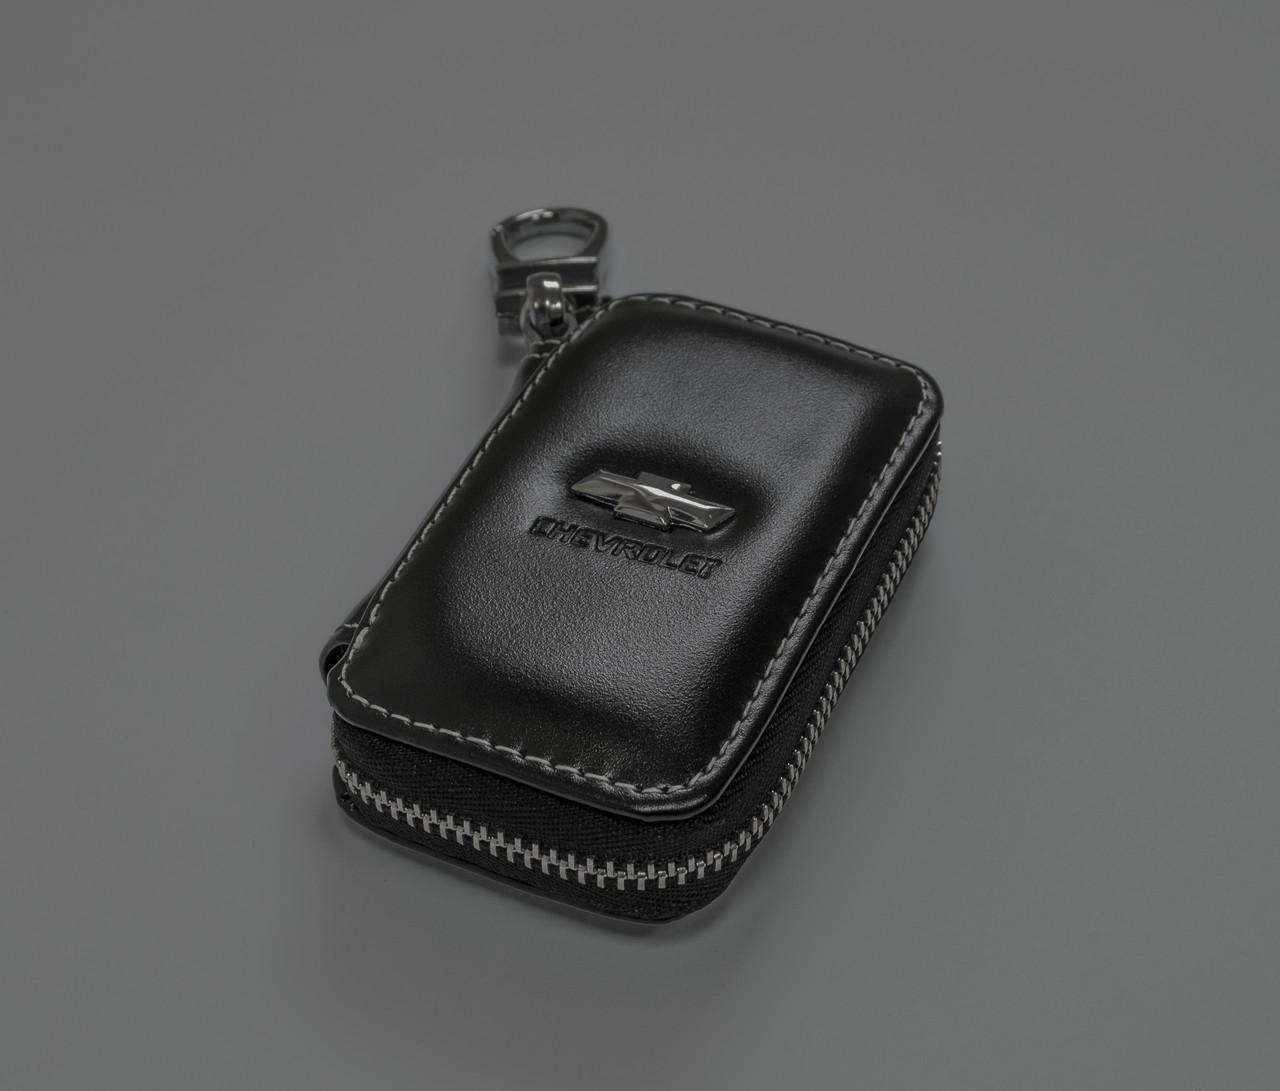 Ключница Carss с логотипом CHEVROLET 14011 черная